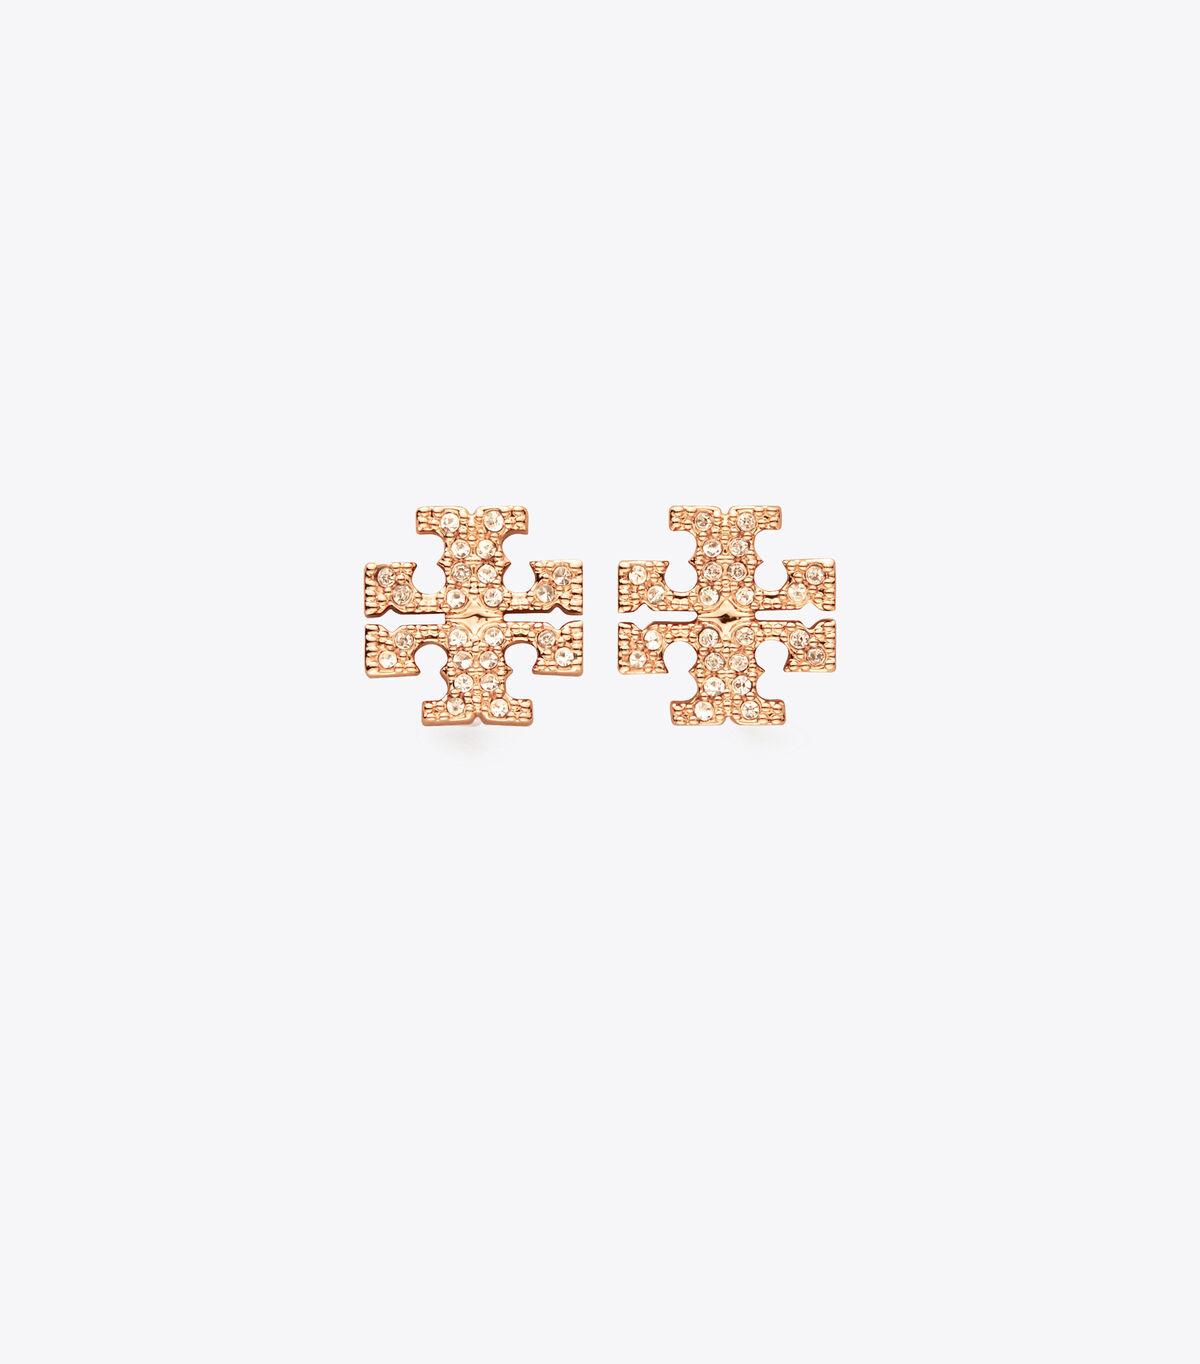 حلق دبوس كريتسال بشعار توري بيرش | 696 | حلق